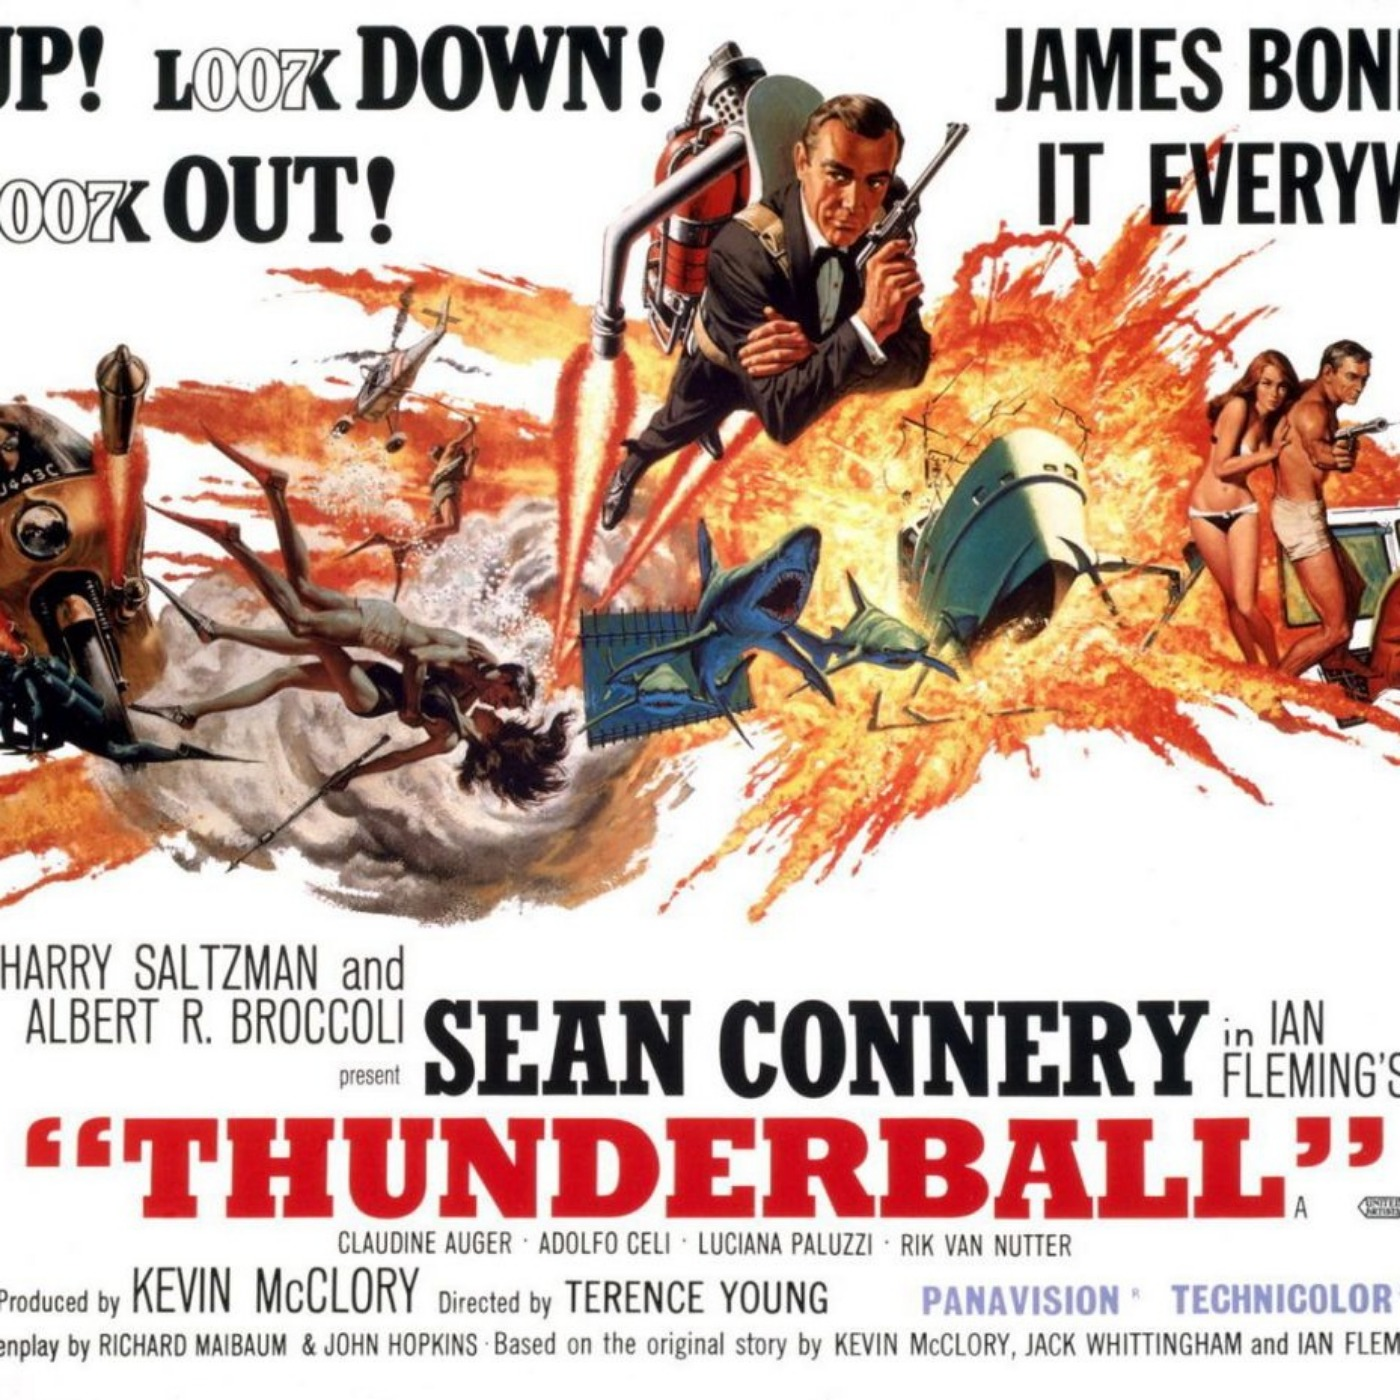 PODCAST CINEMA   Critique du film Opération Tonnerre   Saga James Bond #6   CinéMaRadio